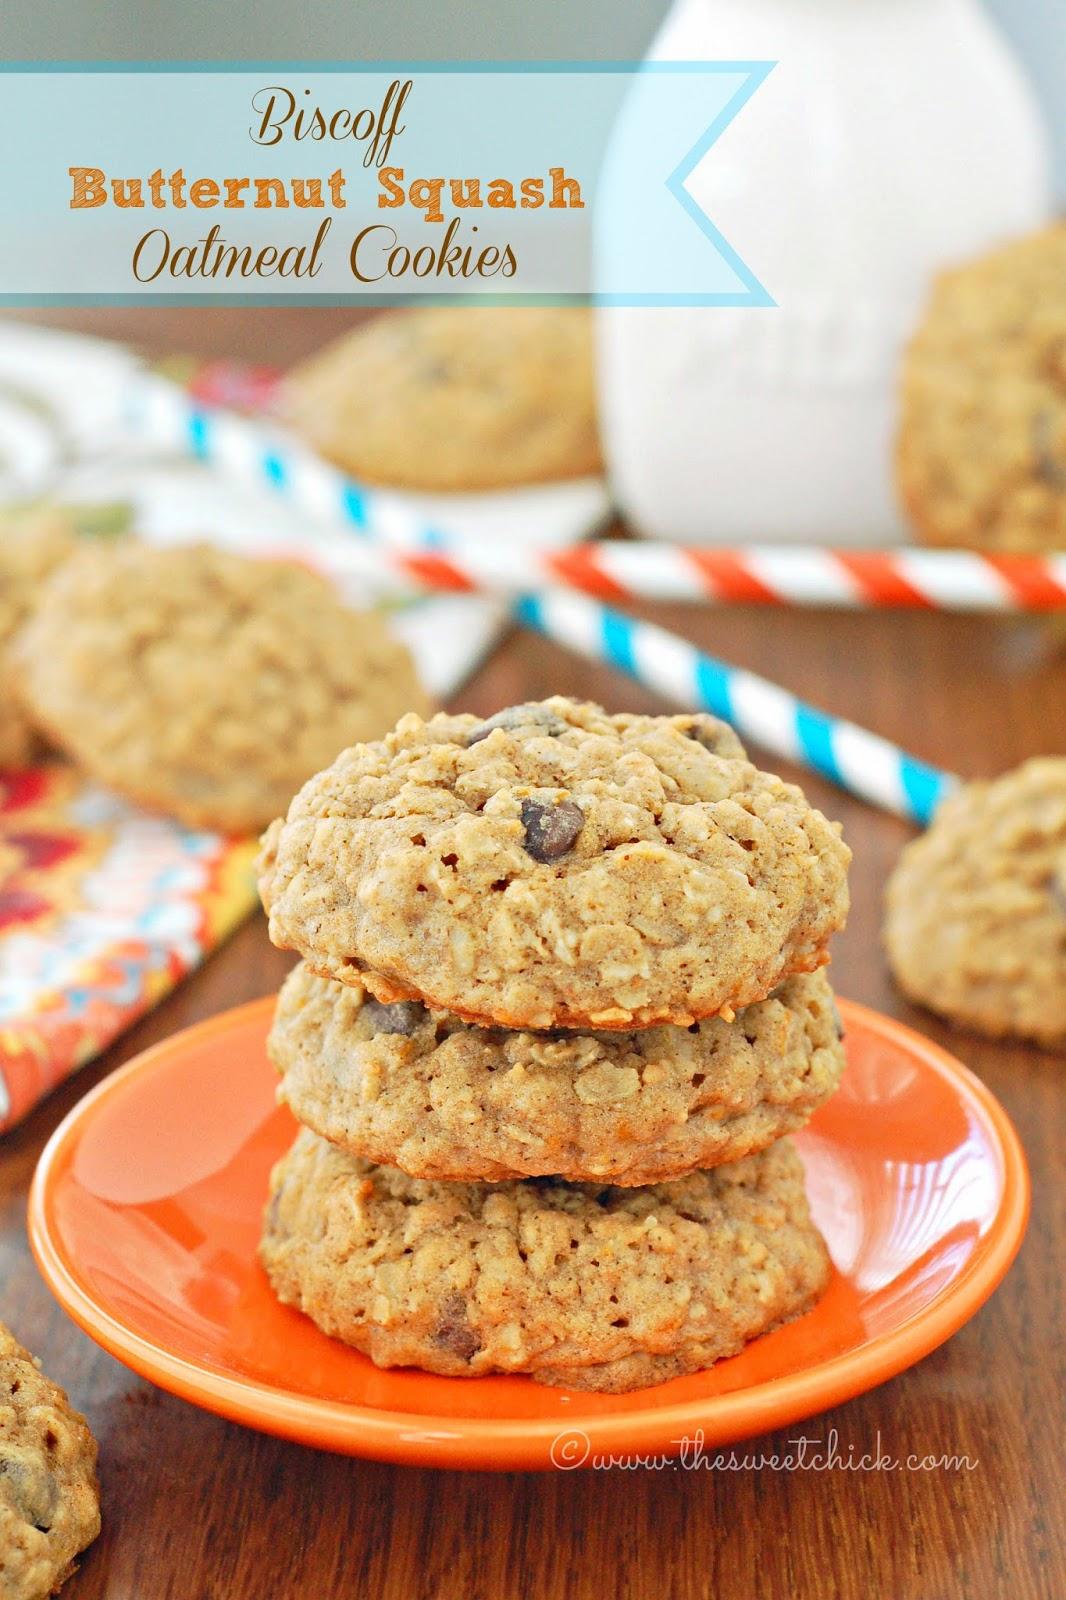 Biscoff #butternutsquash #oatmeal #cookies #dessert #snack #fall